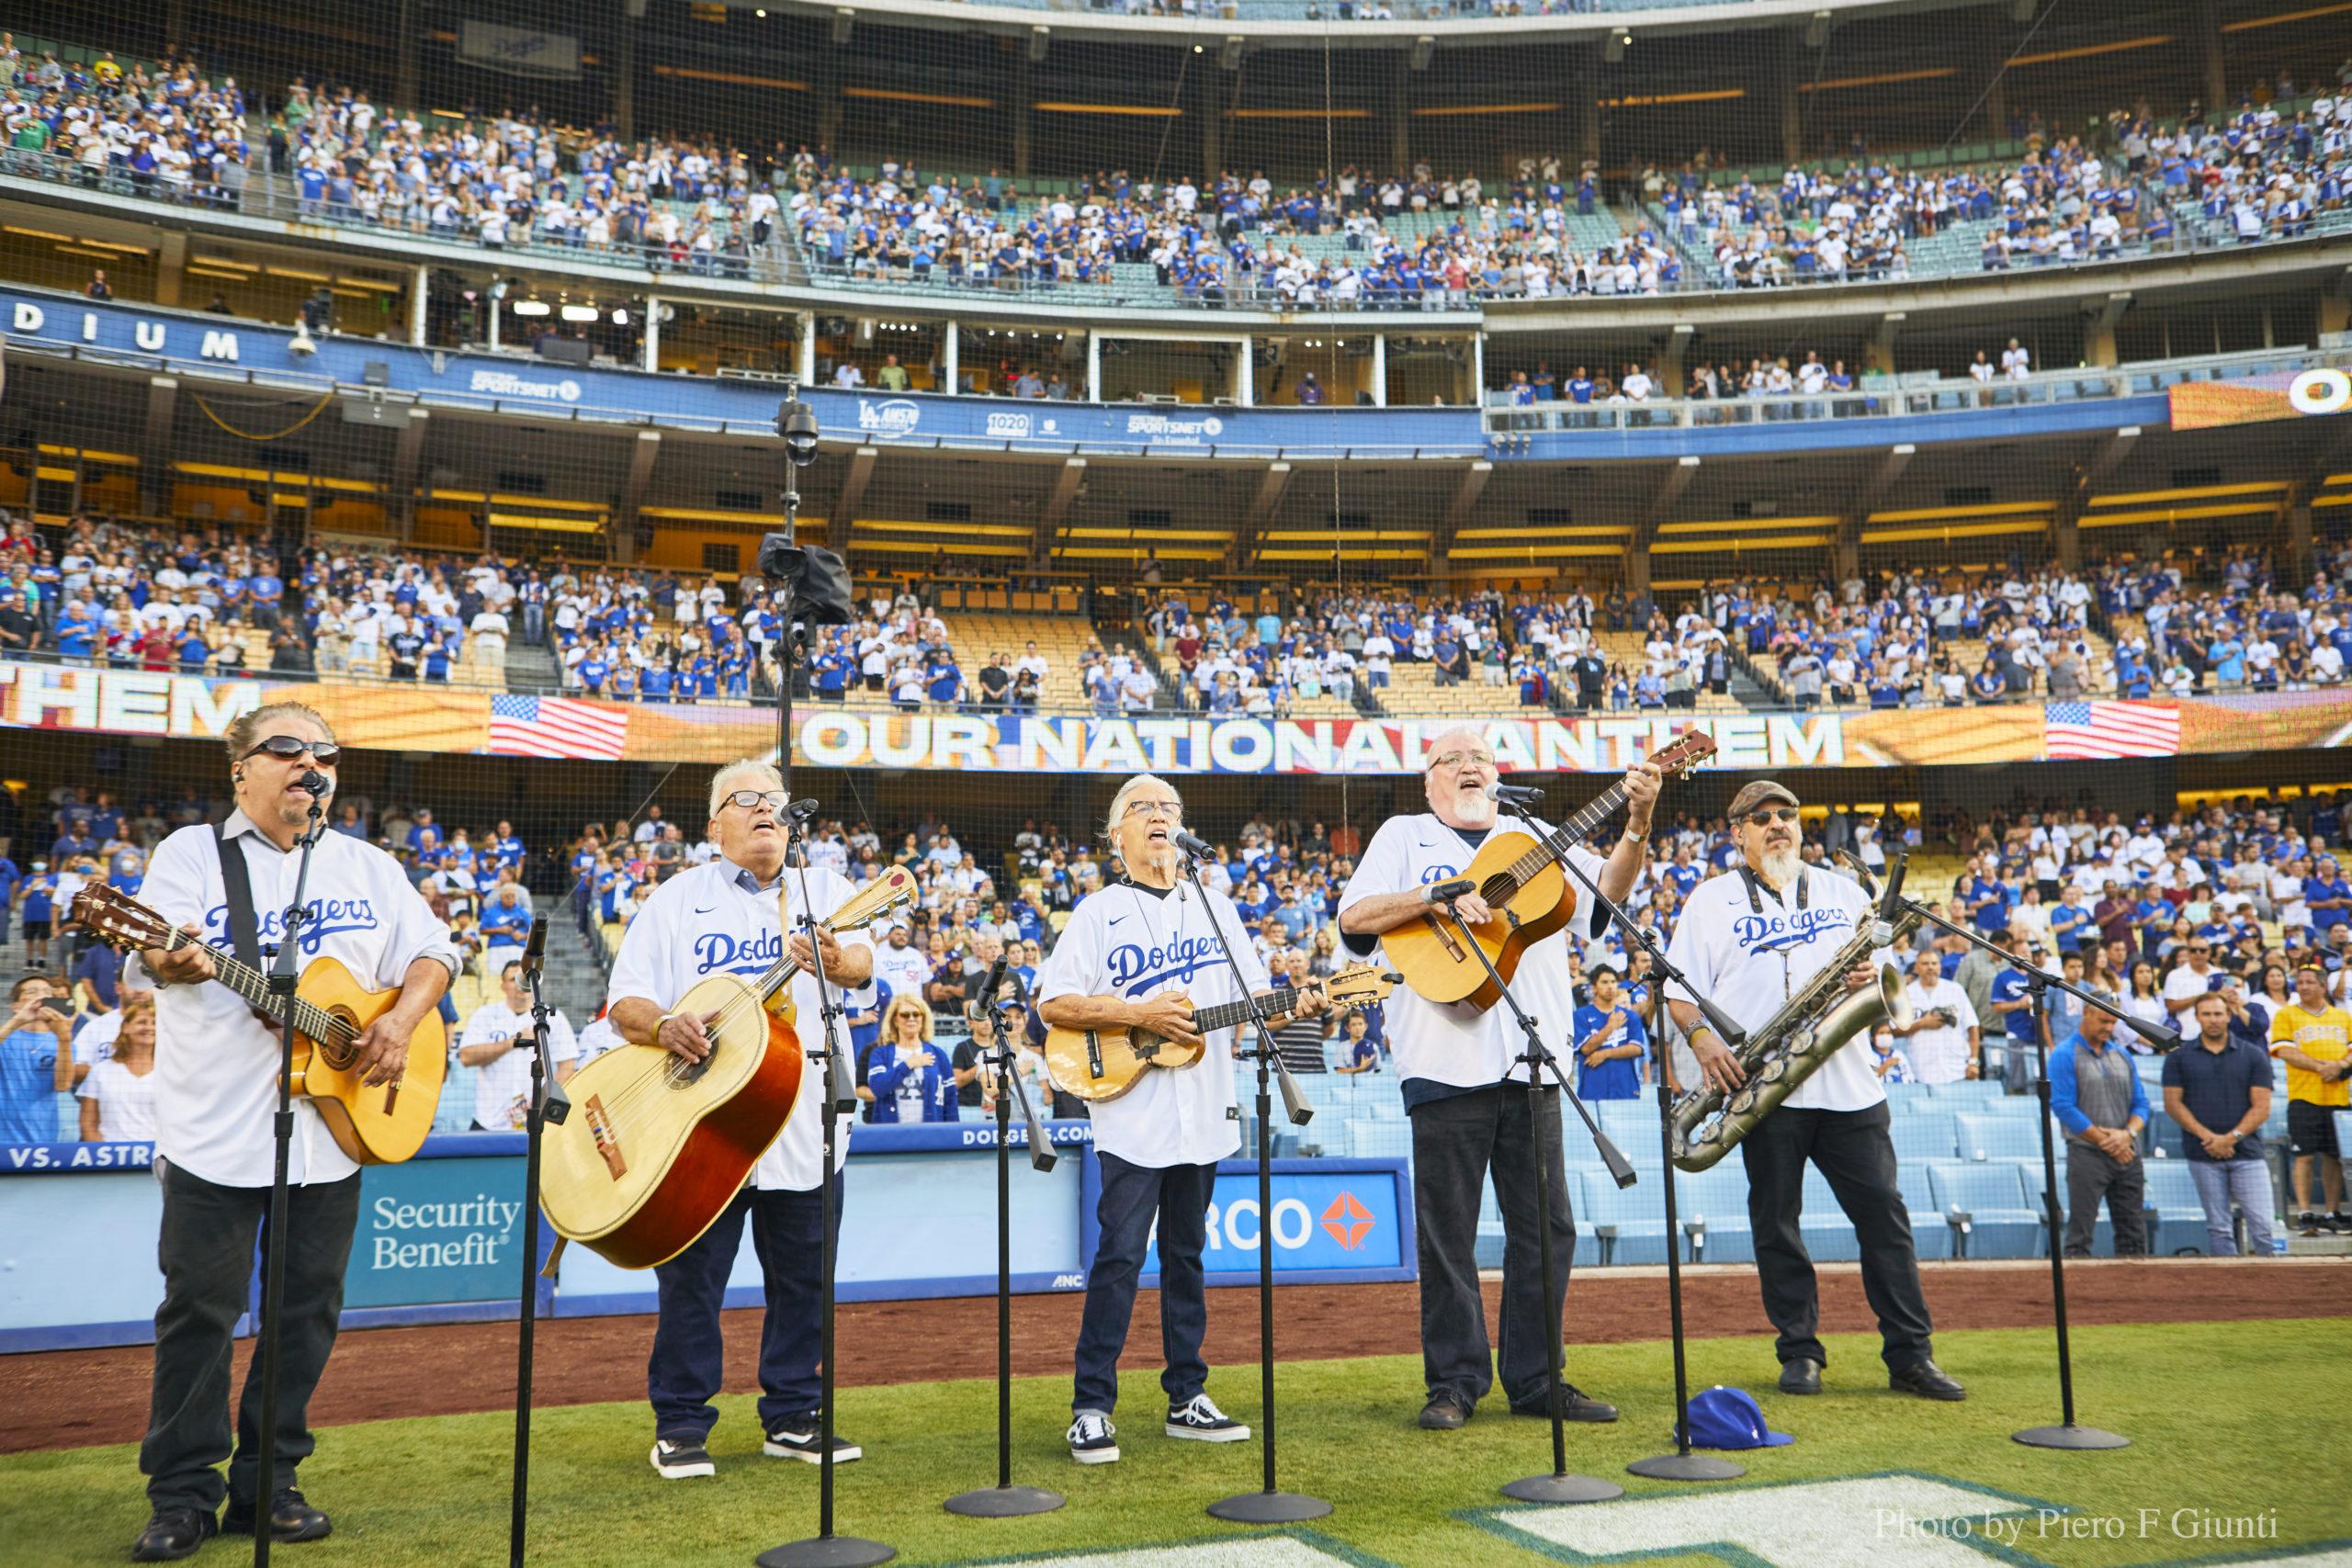 Los-Lobos-Dodgers-National-Anthem-2021